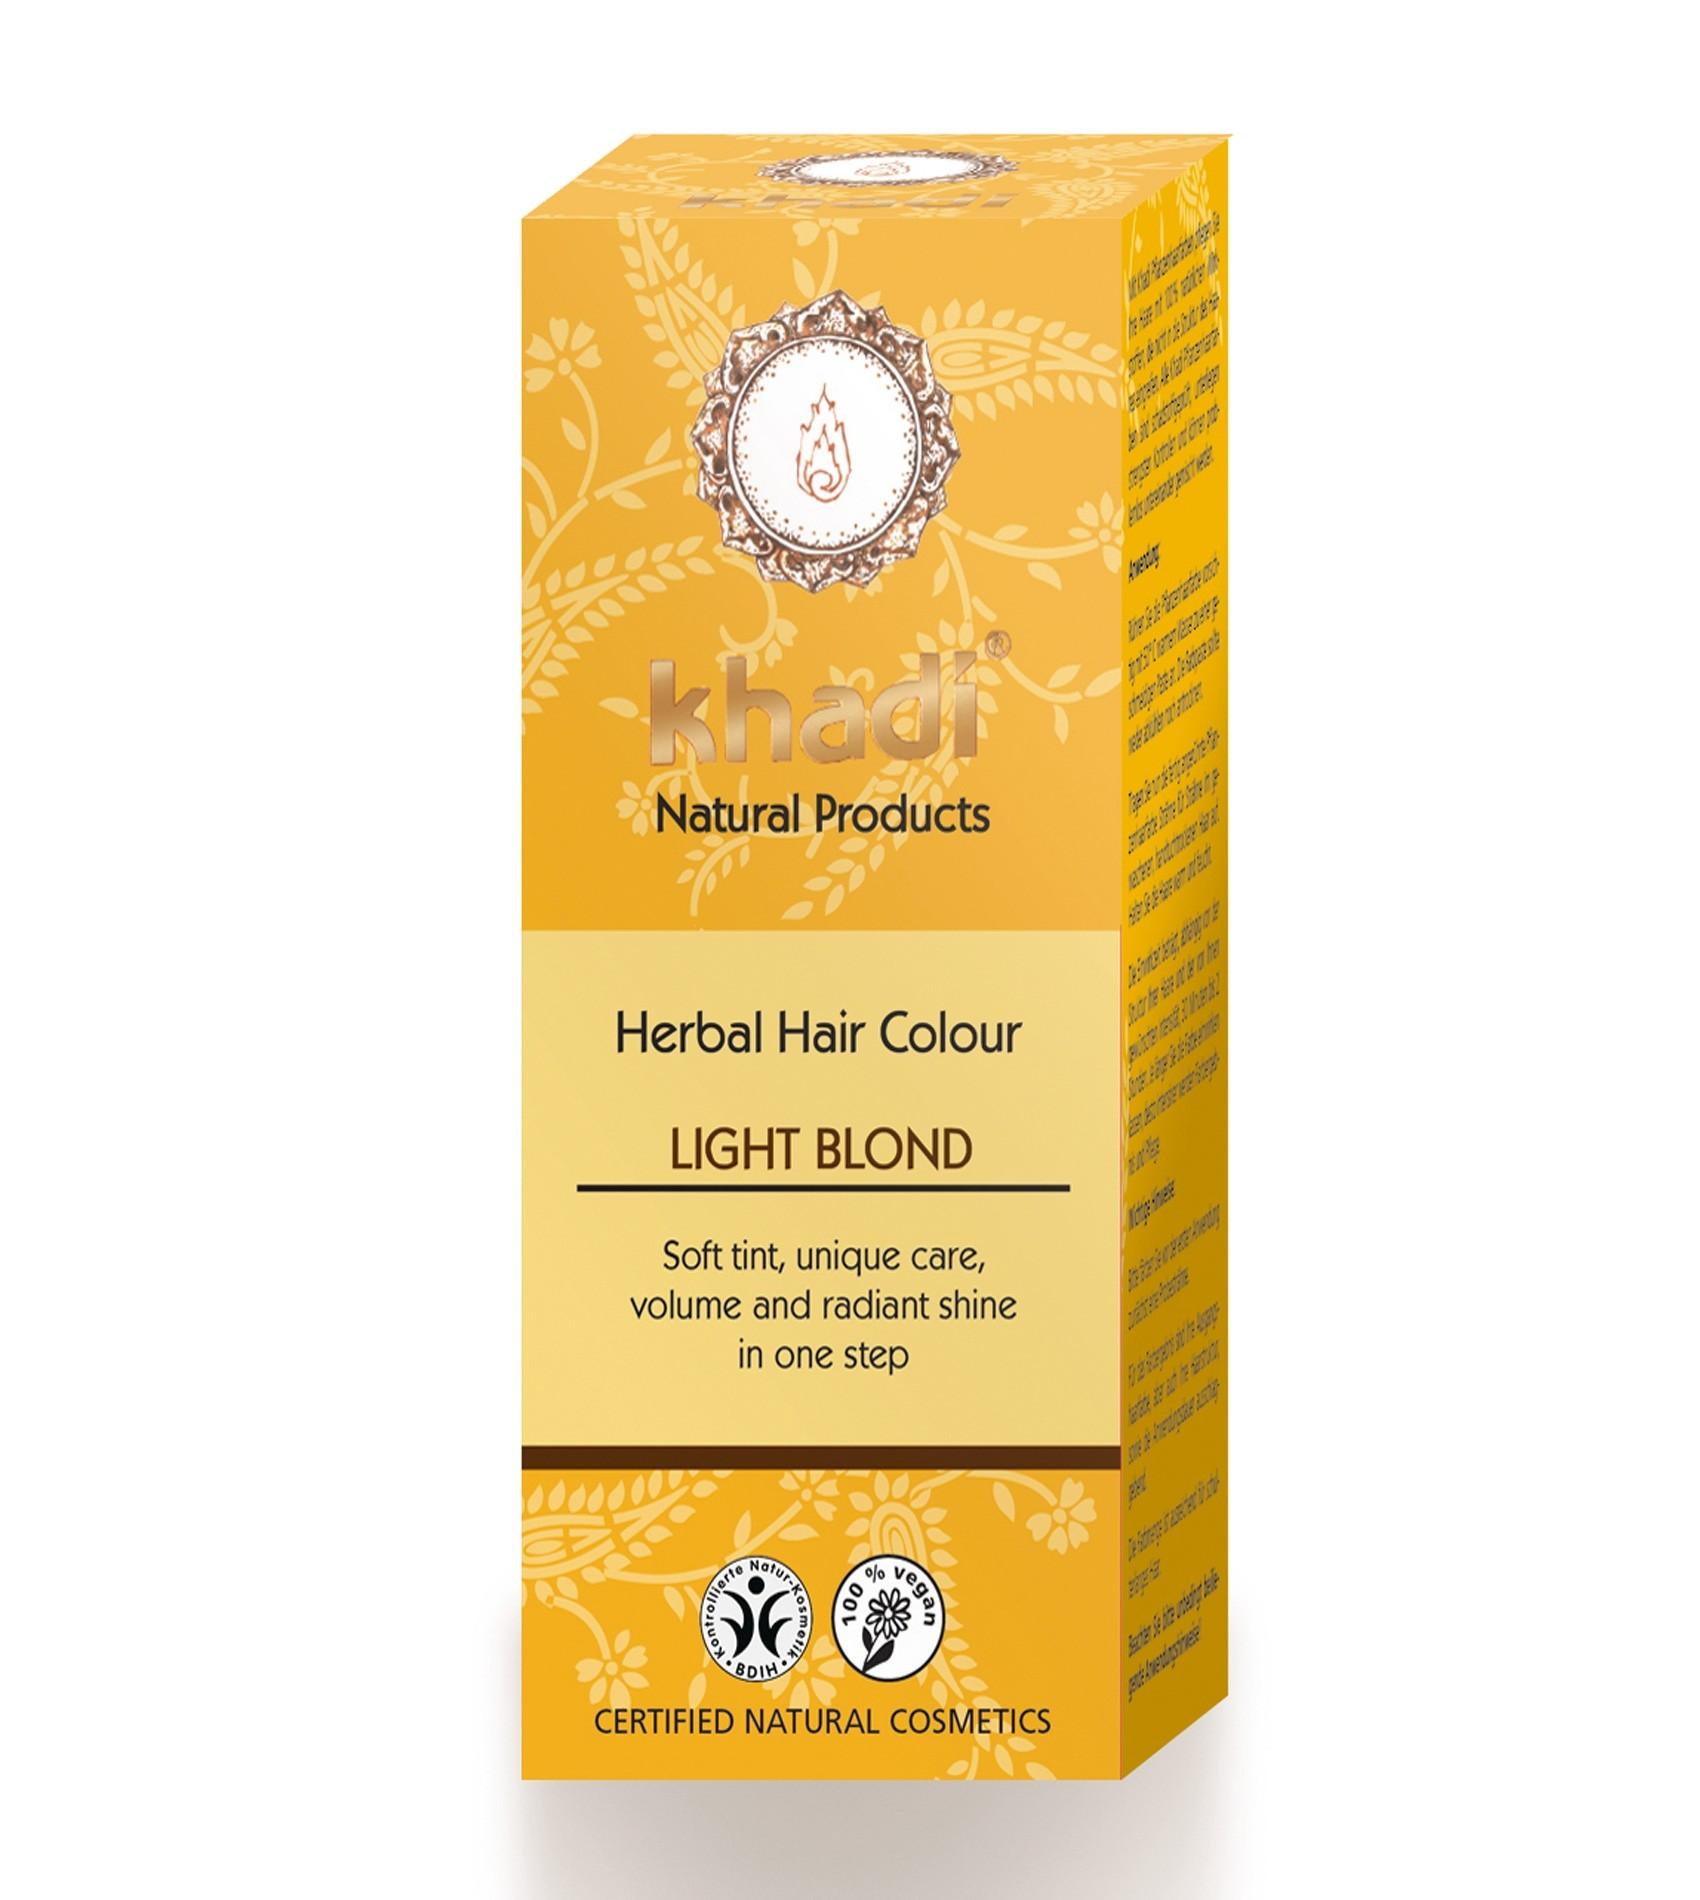 Khadi Herbal Hair Colour Light Blonde